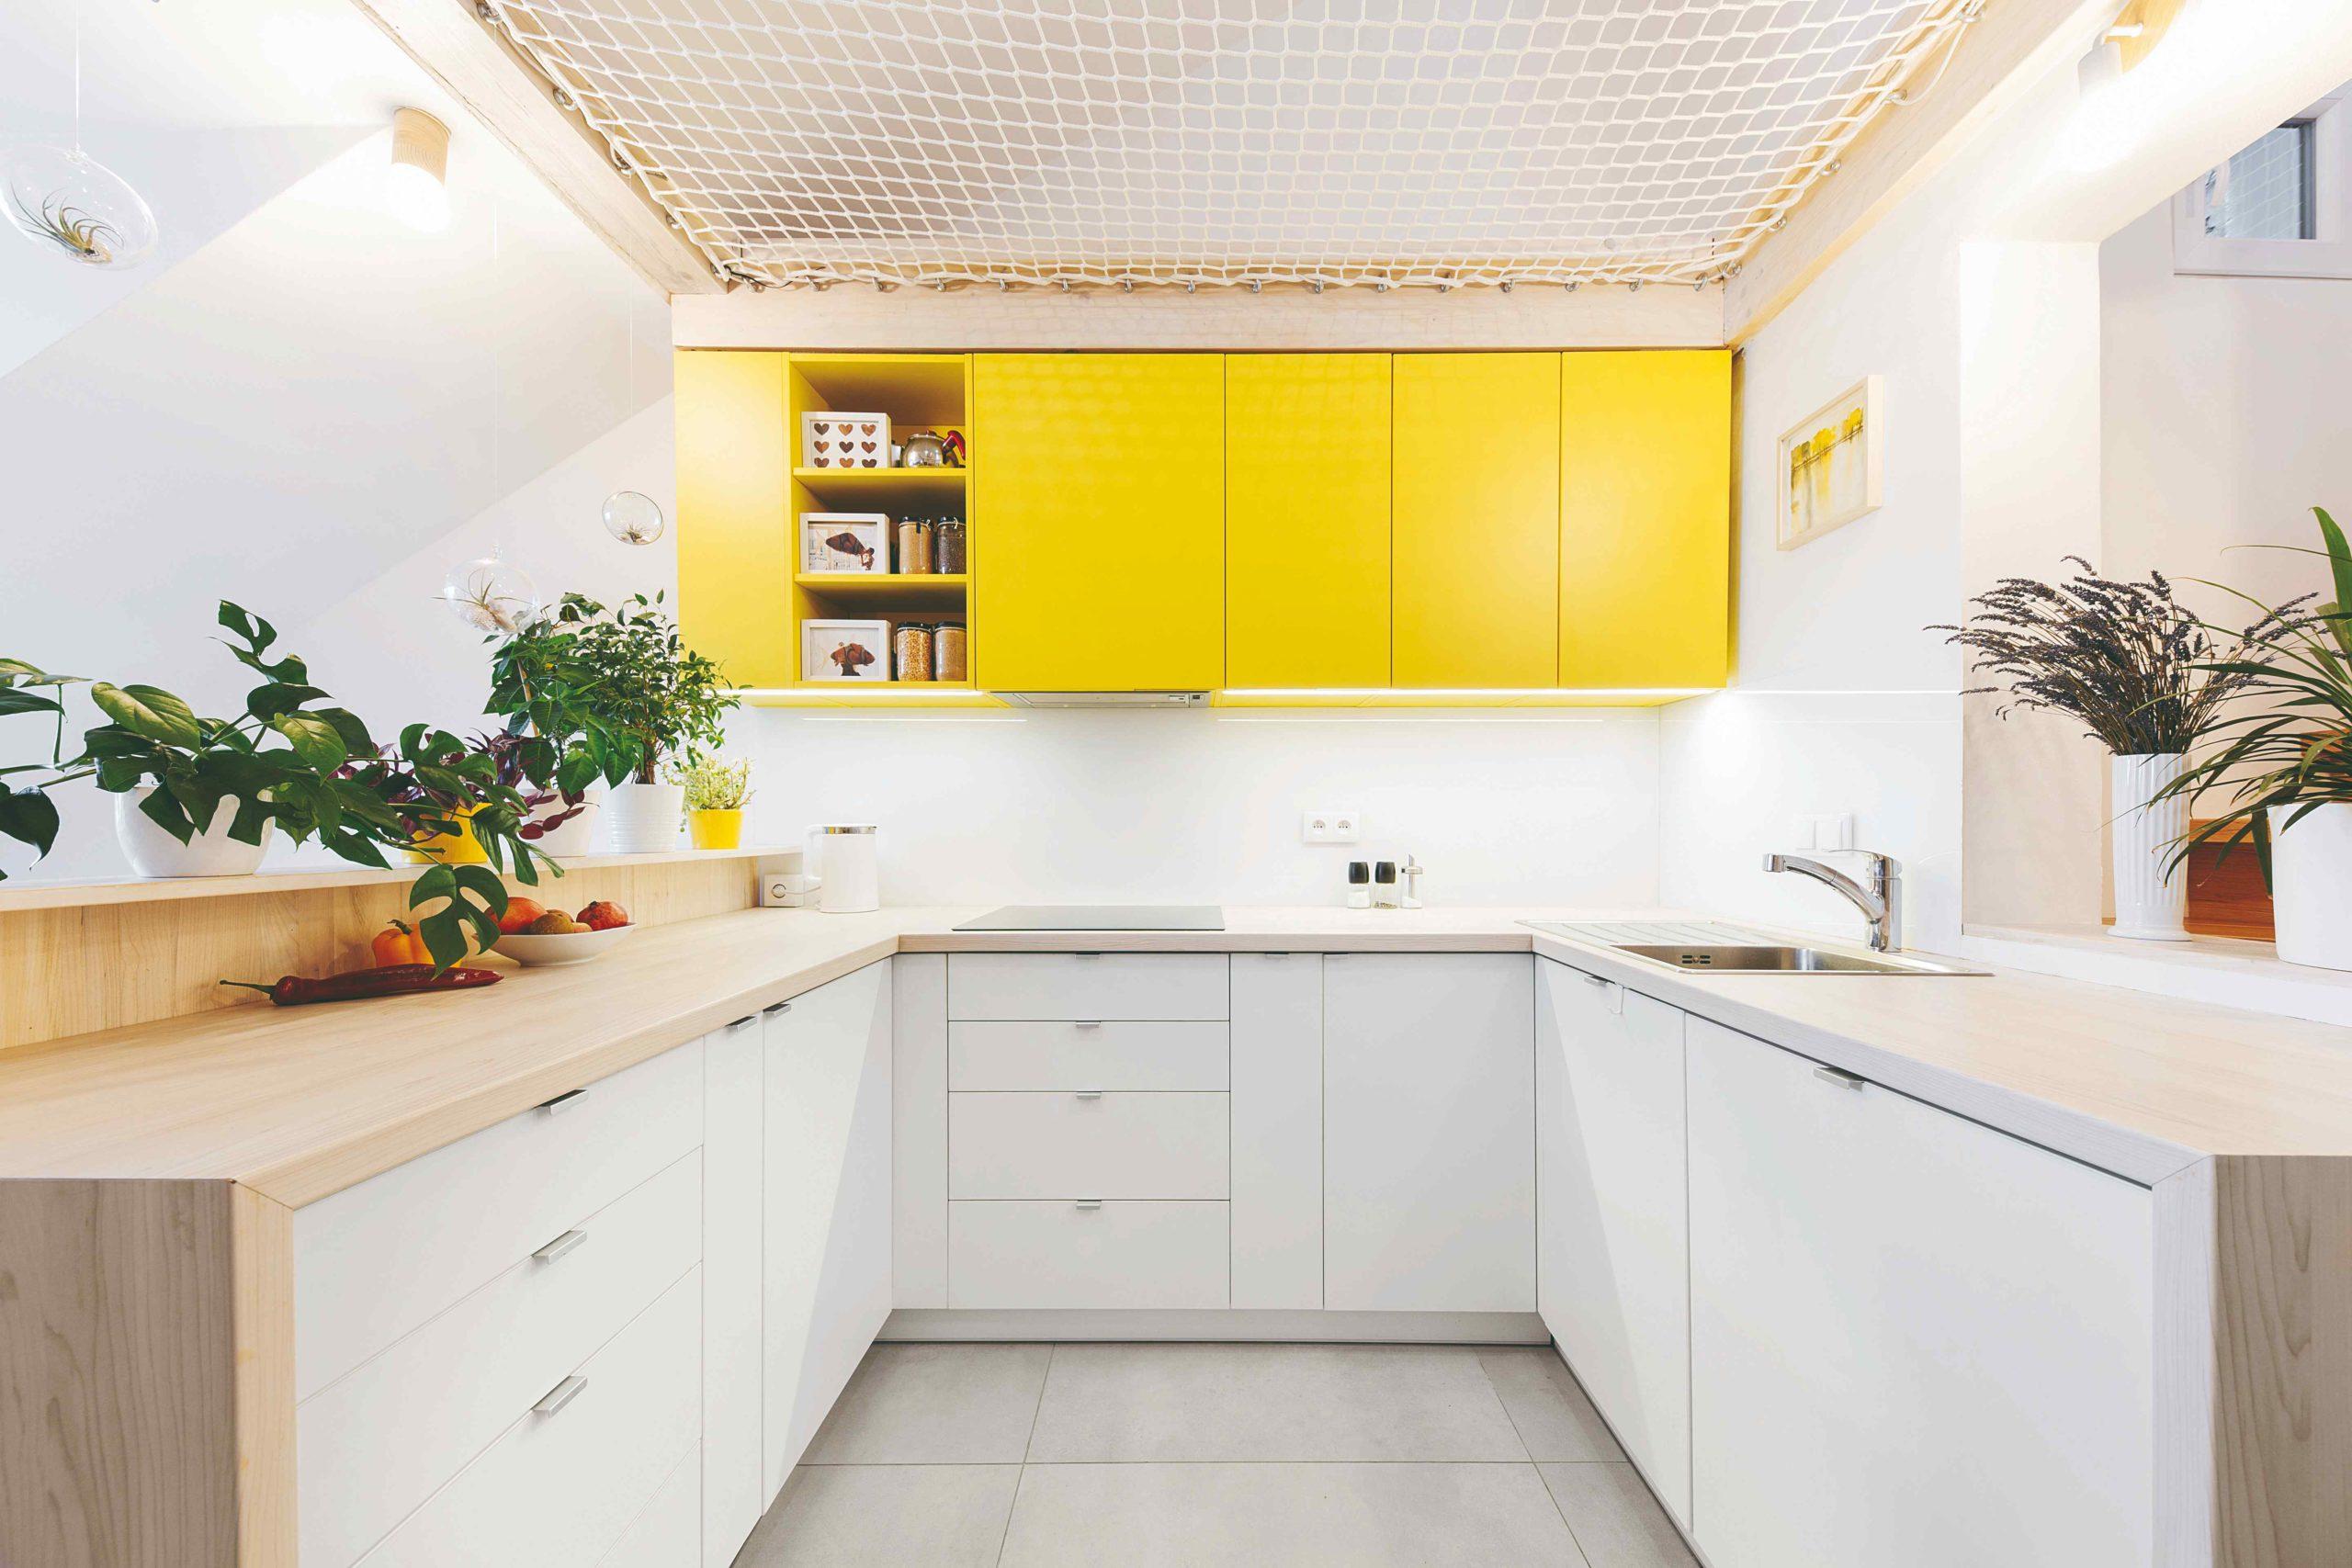 Kuchyň so žlutými skříňkami